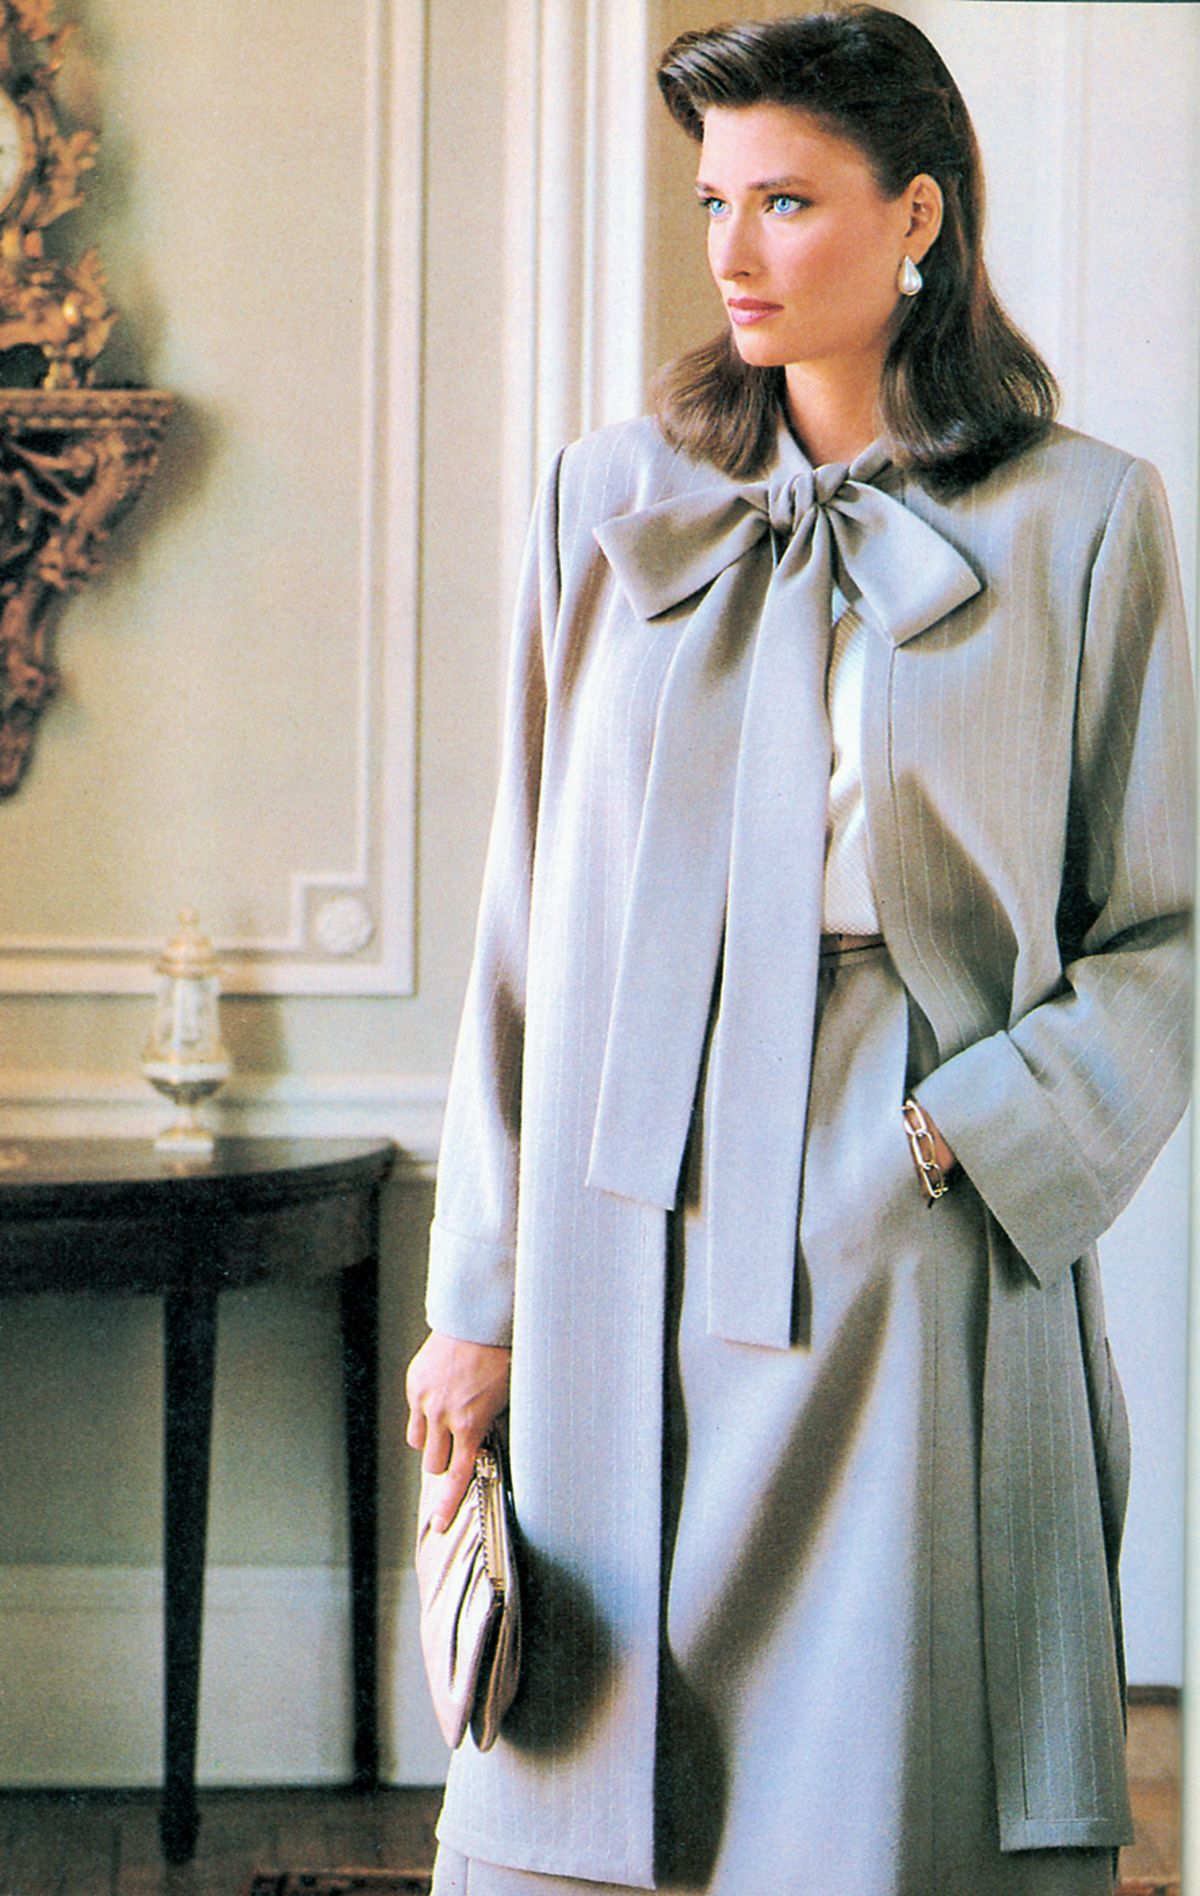 Rosemary Mcgrotha In Vogue Pattern Jul 1982 Rosemary